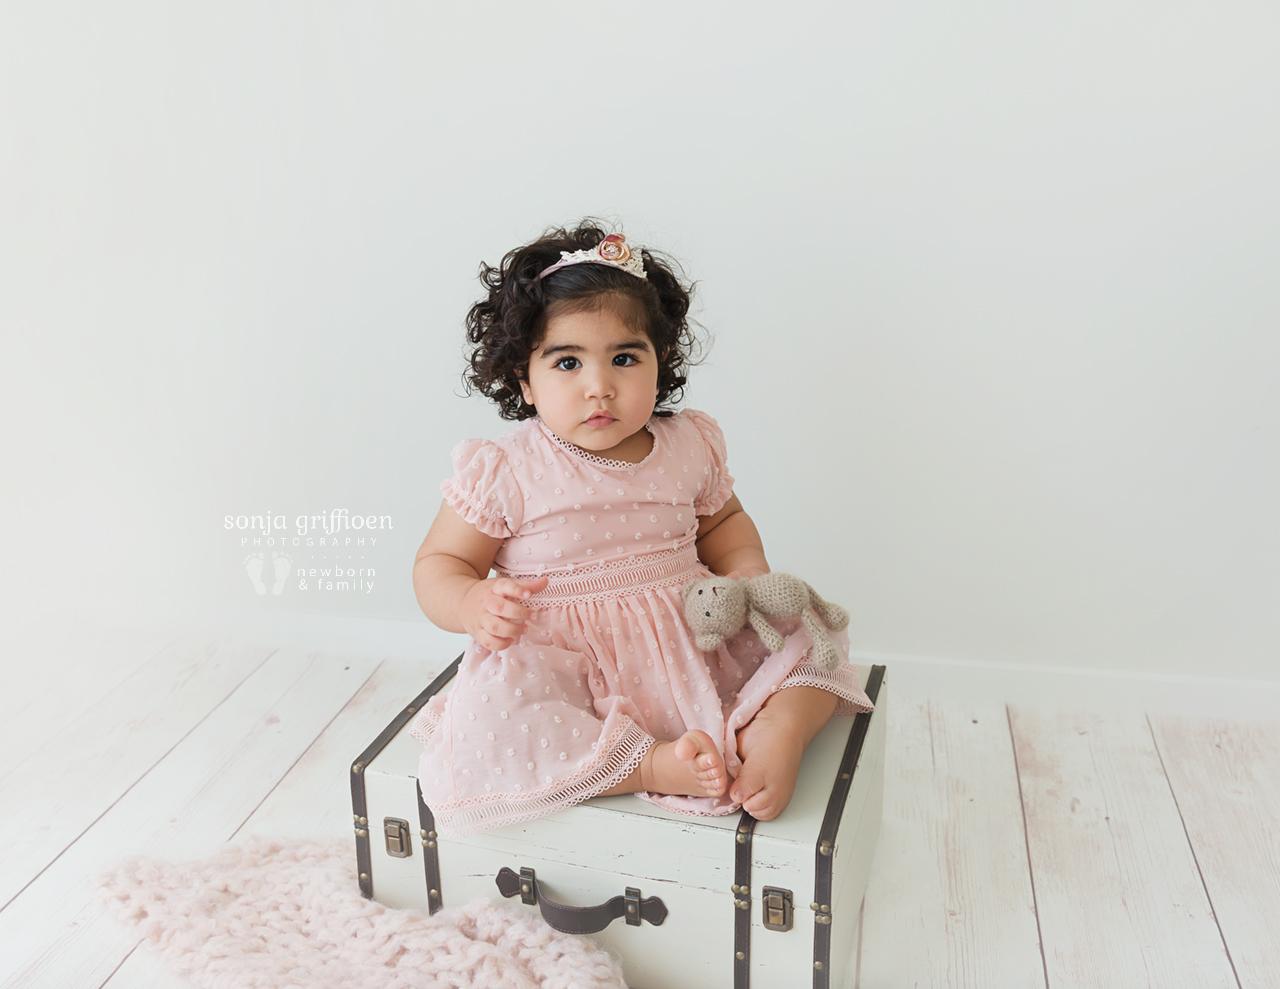 Yara-1-Brisbane-Baby-Photographer-Sonja-Griffioen-05.jpg